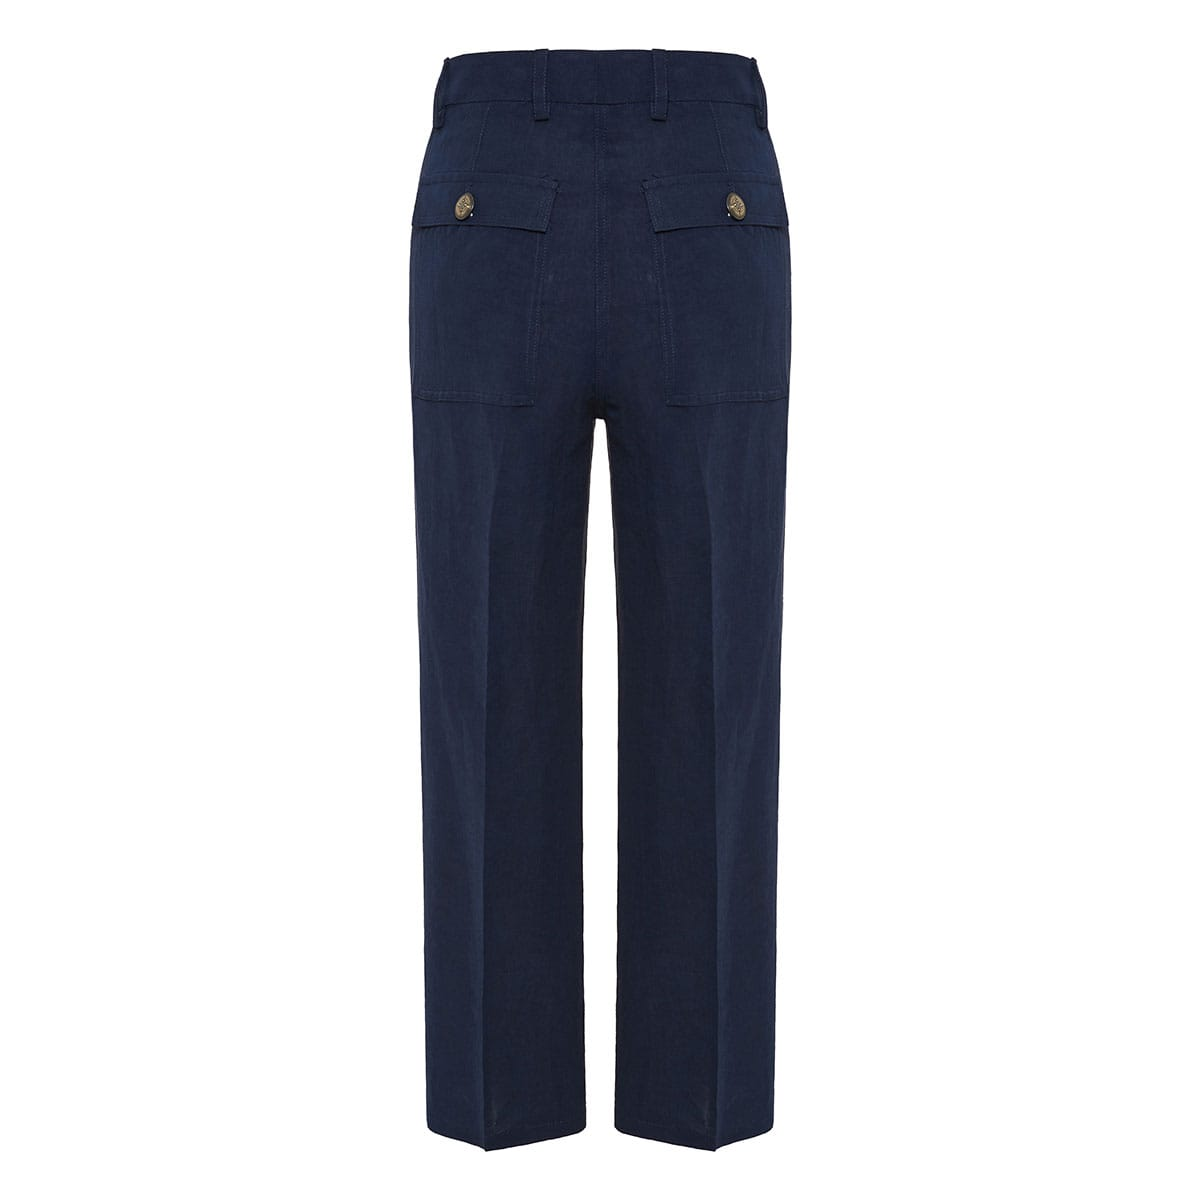 Wide-leg cropped linen trousers